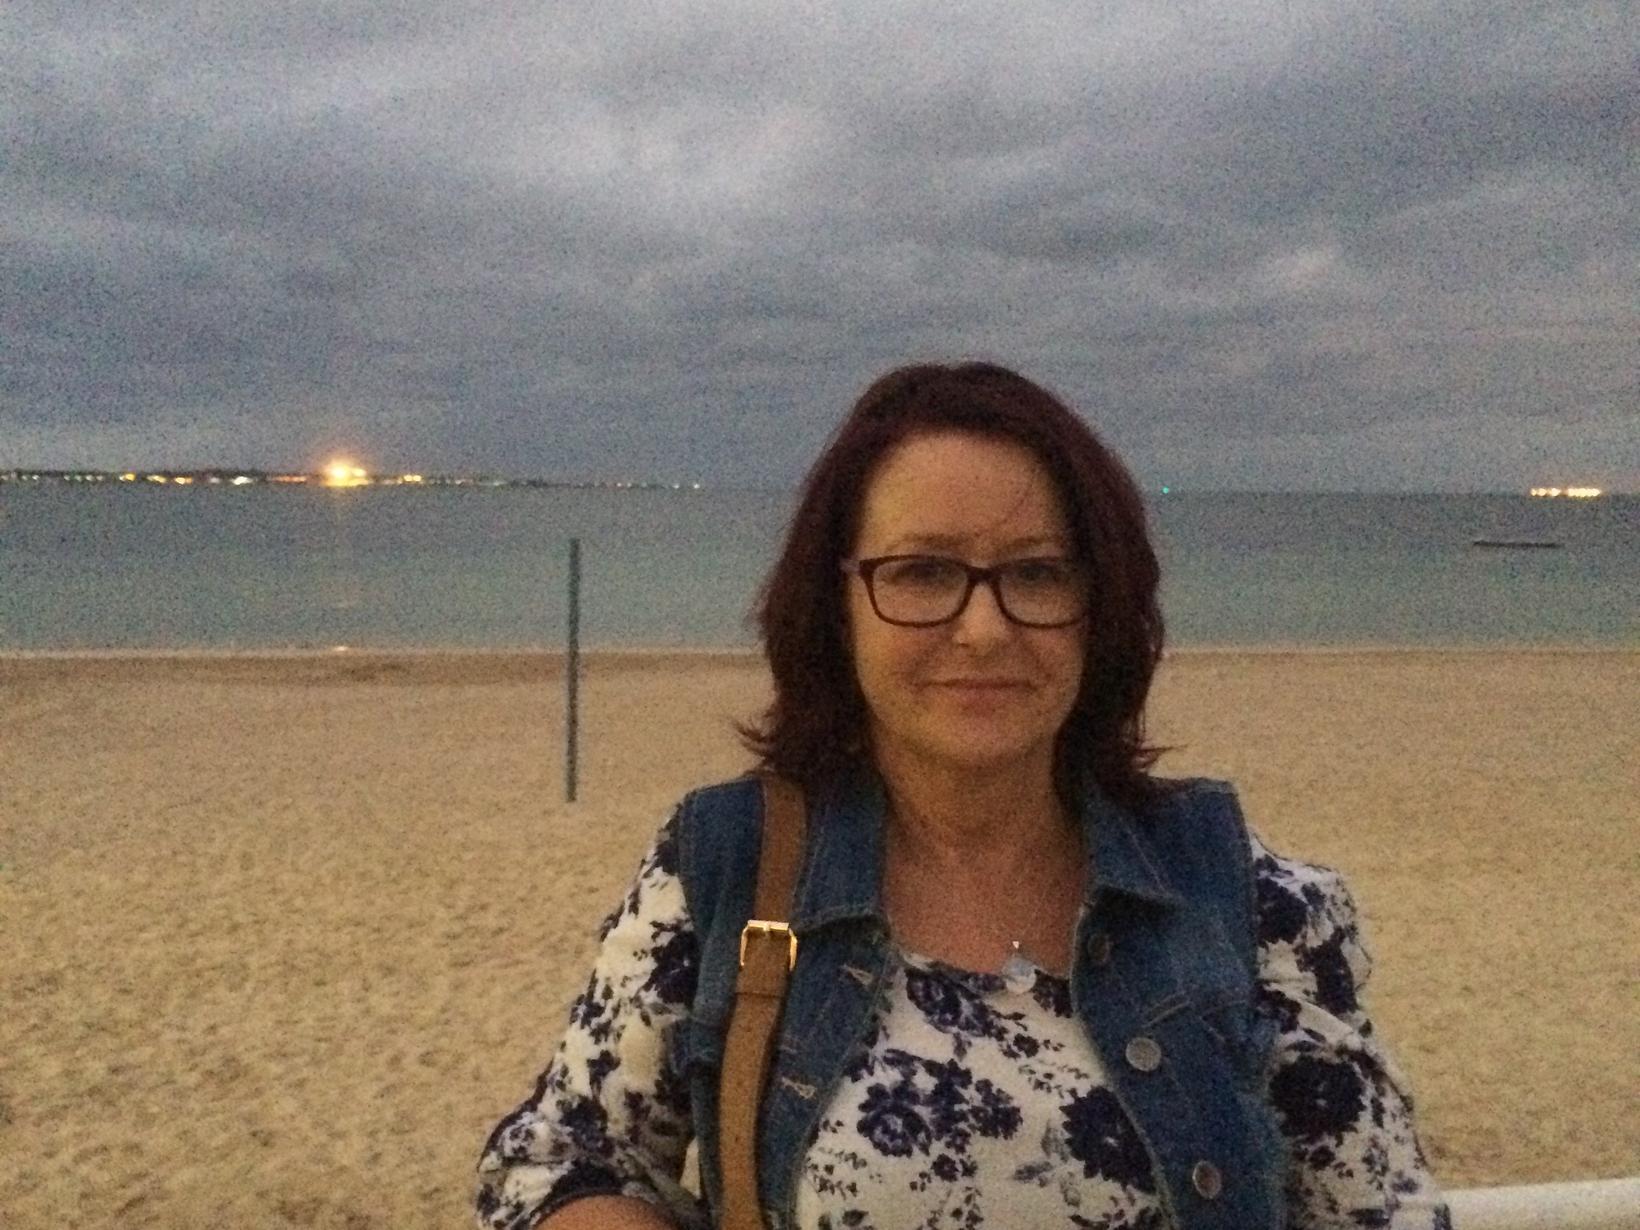 Katrina from Perth, Western Australia, Australia